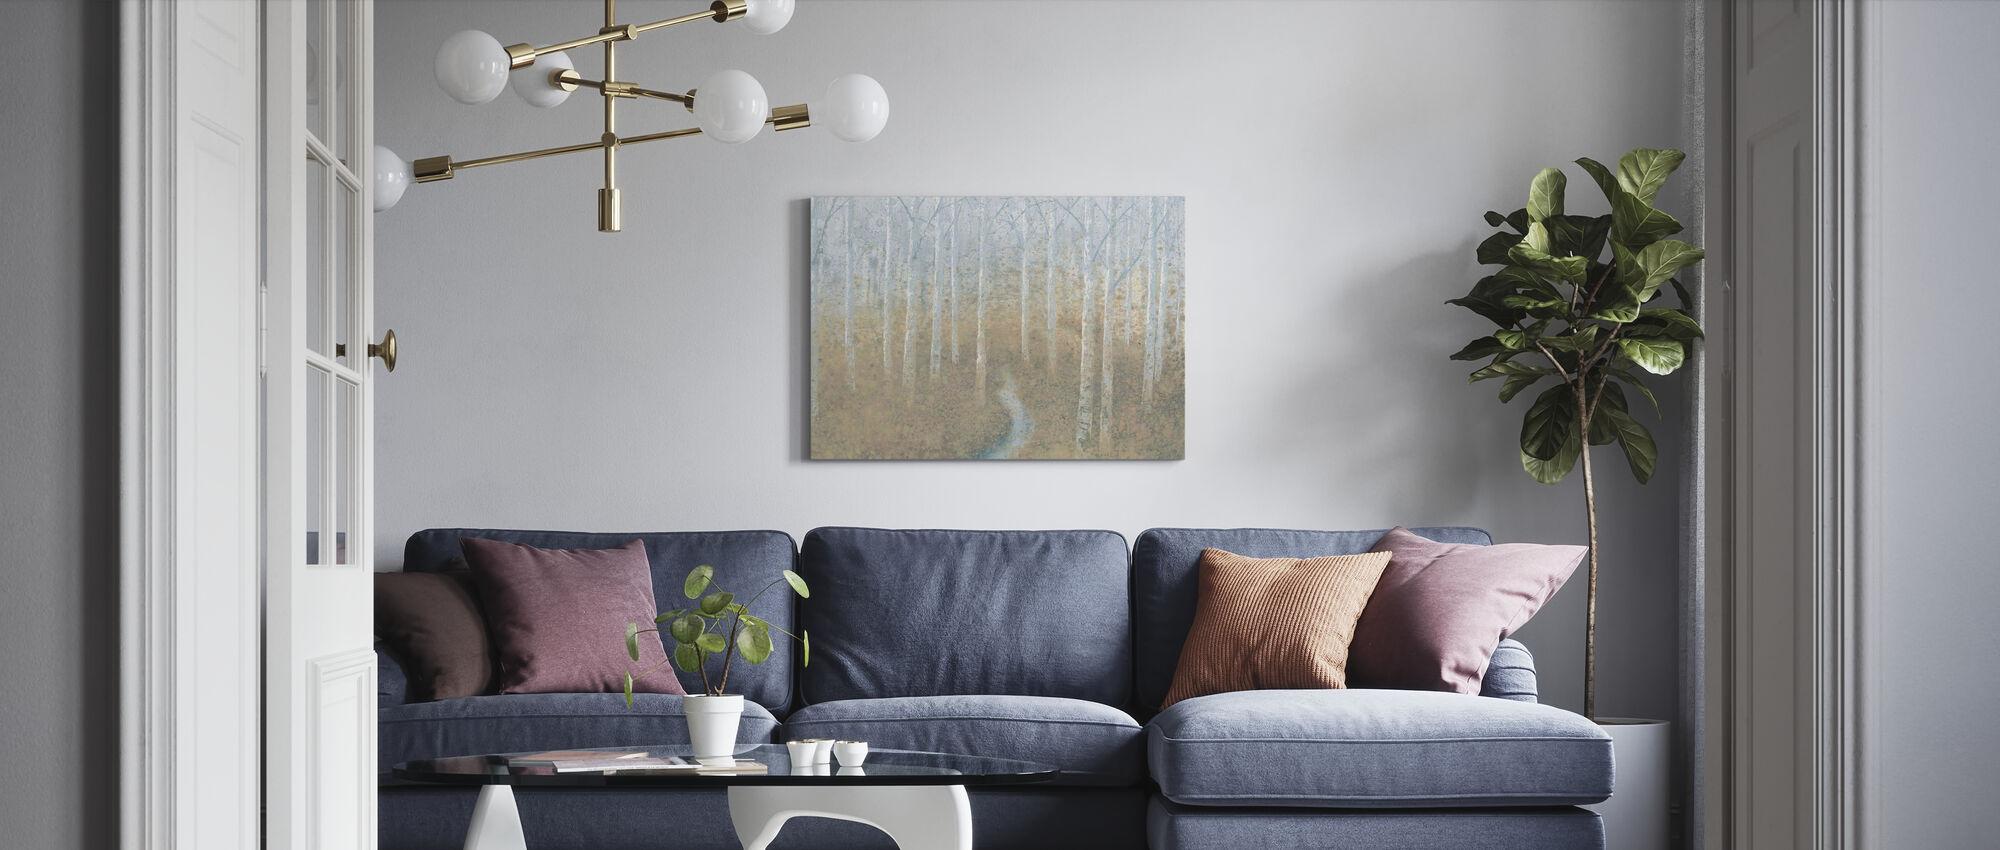 Sølvfarvann - Lerretsbilde - Stue